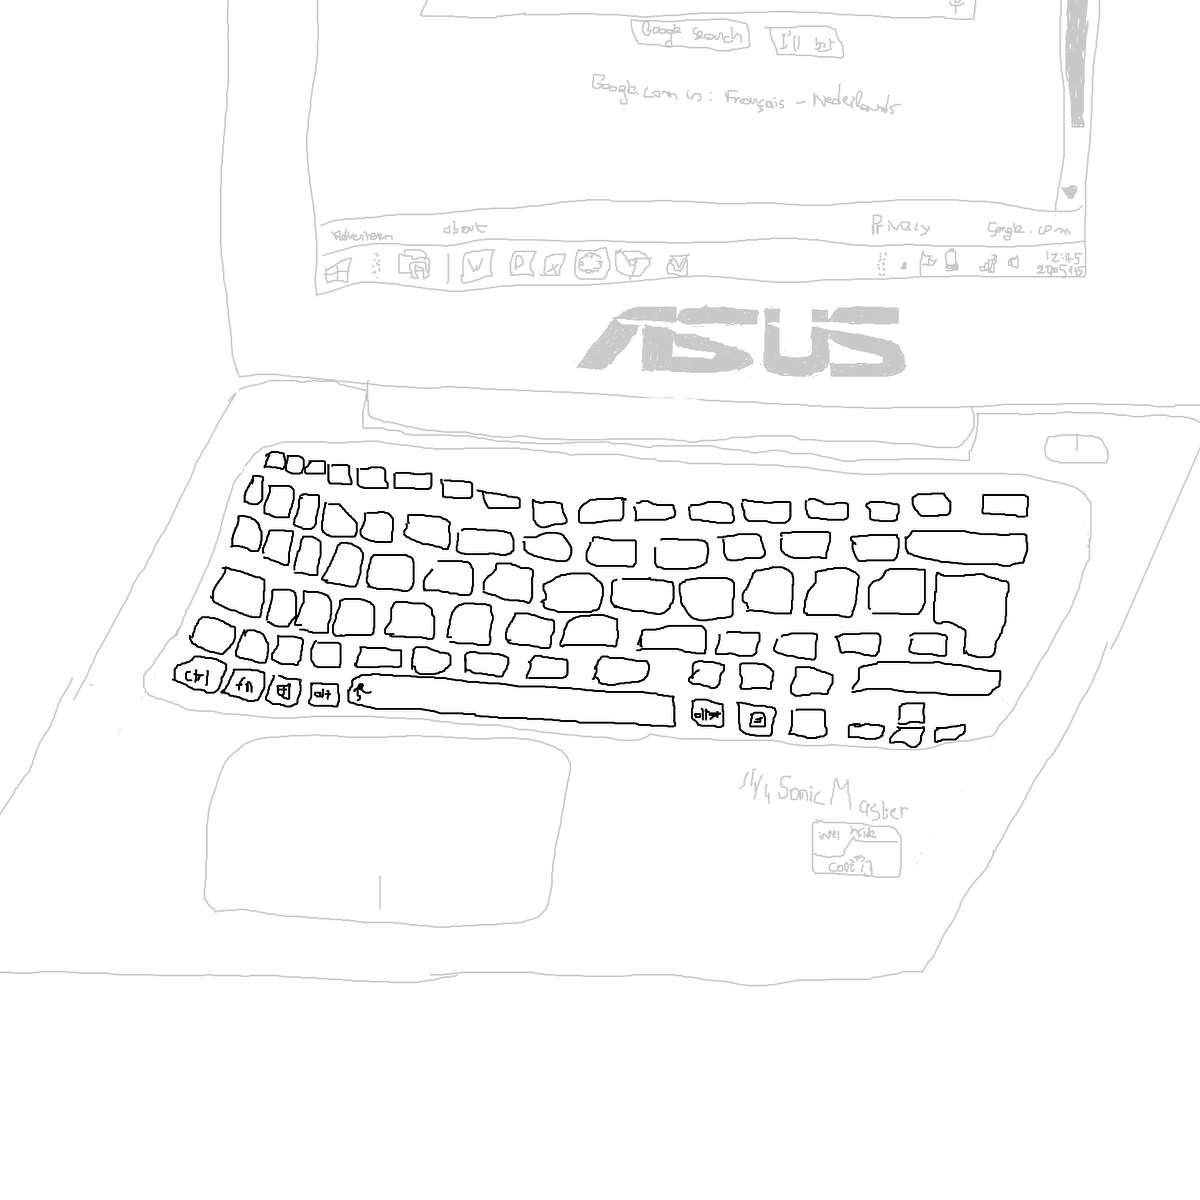 BAAAM drawing#17171 lat:51.2066802978515600lng: 3.2588202953338623